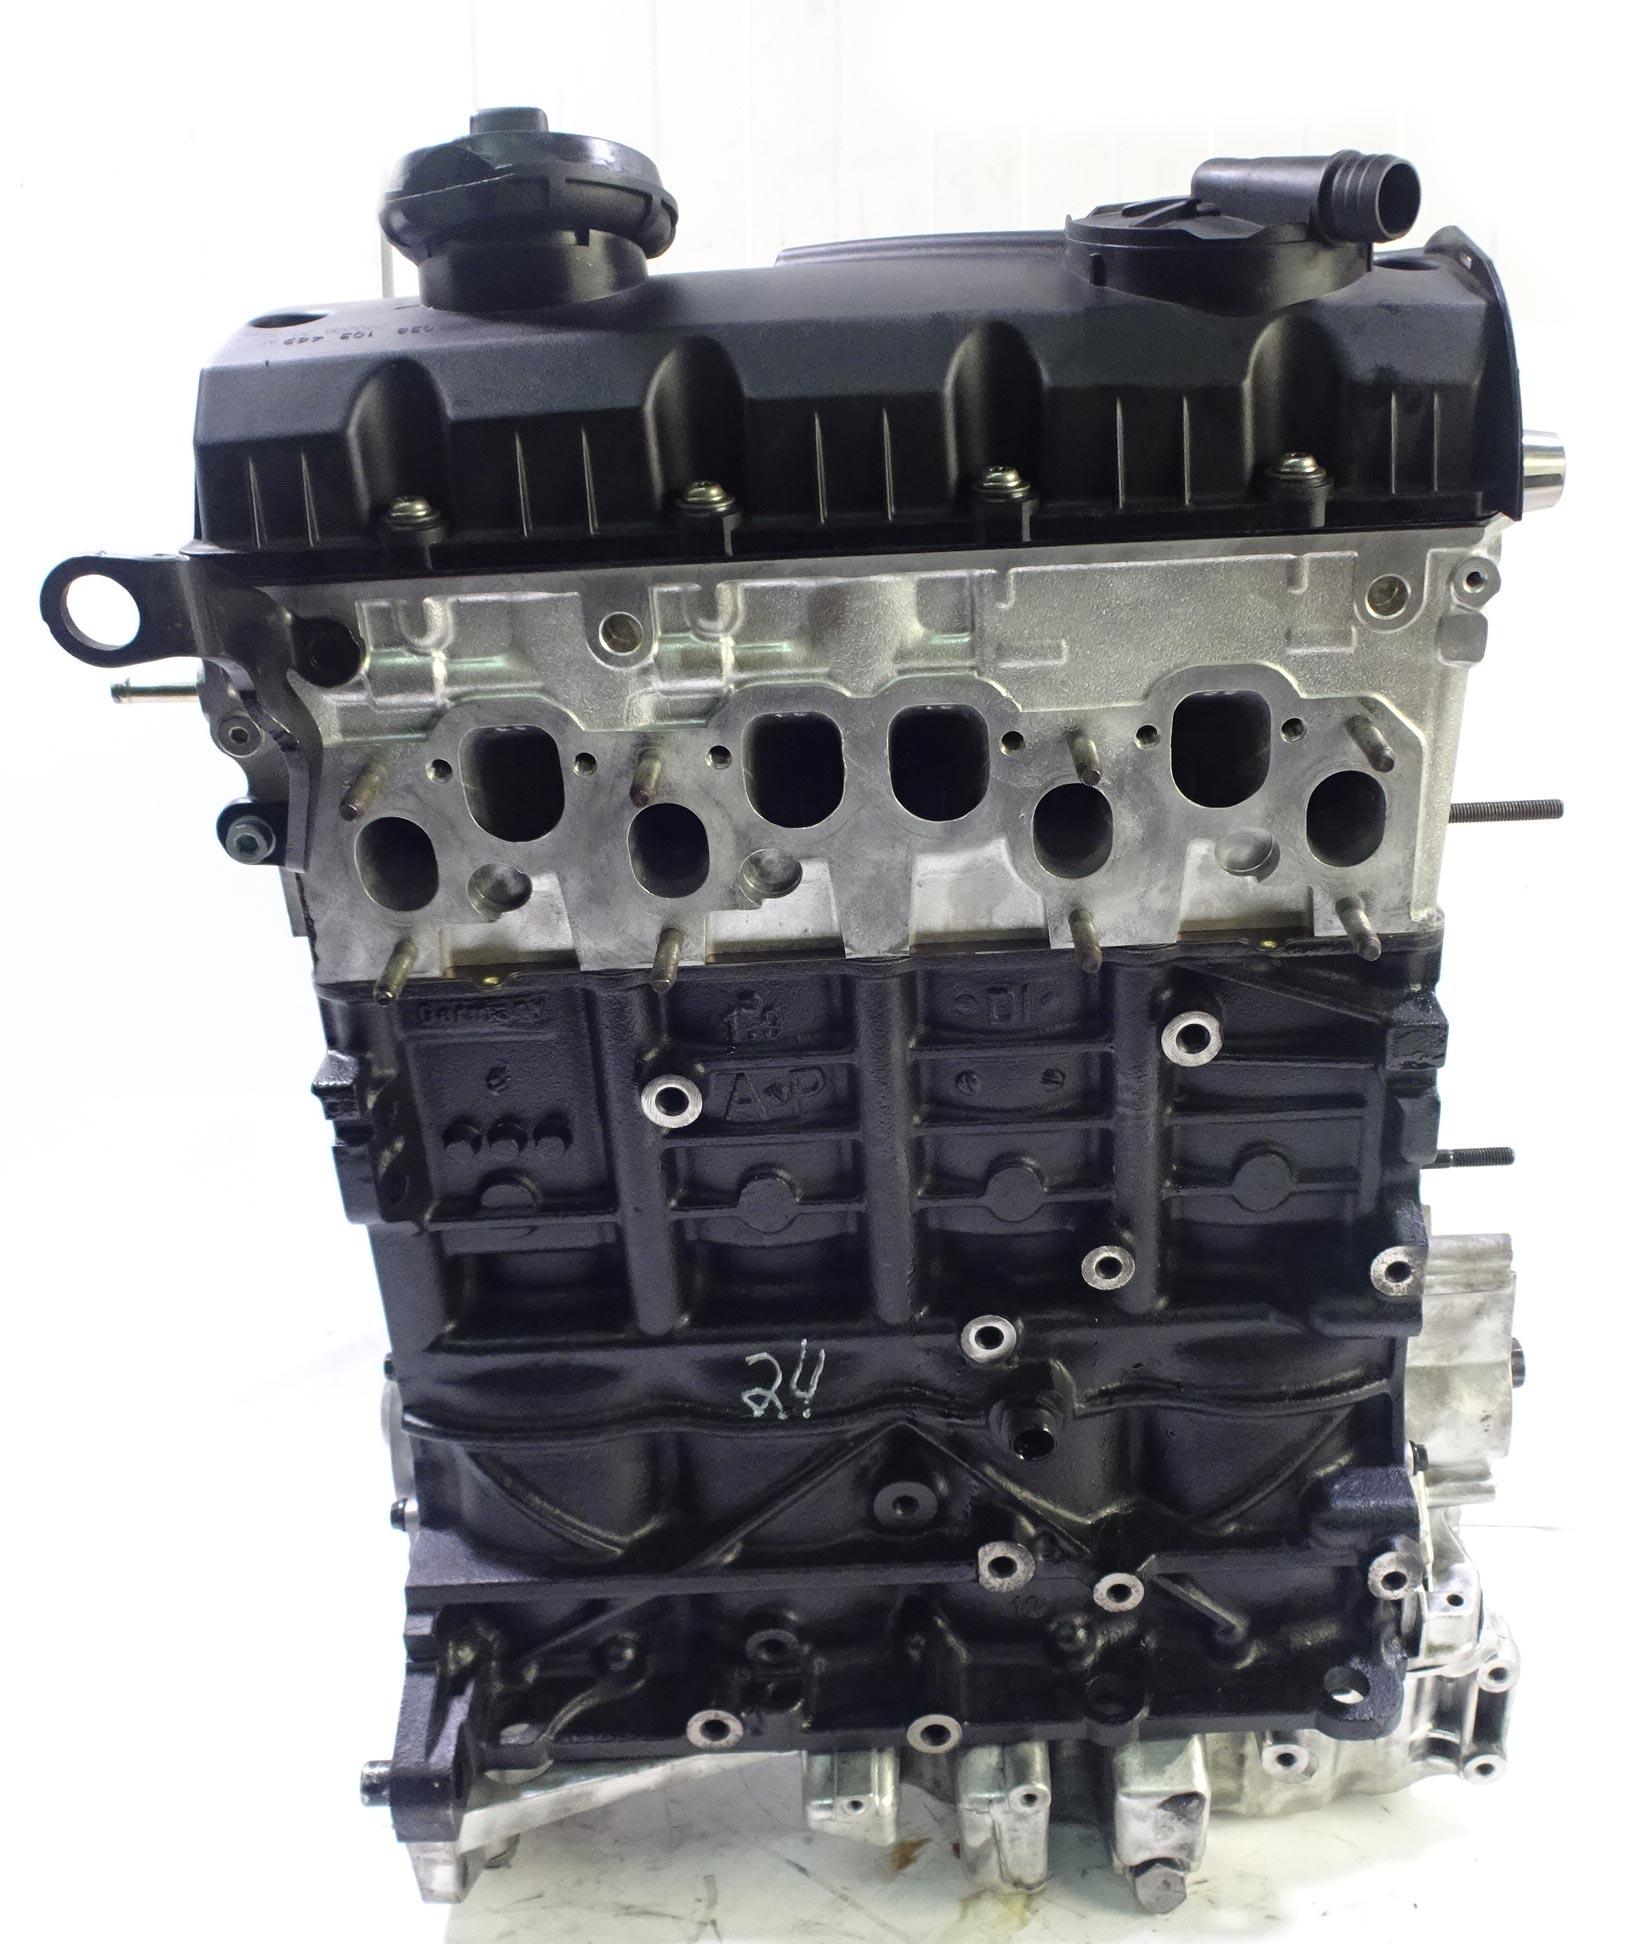 Motor 2006 Audi A4 B7 1,9 TDI Diesel BRB Nockenwelle Dichtung NEU Kopf geplant